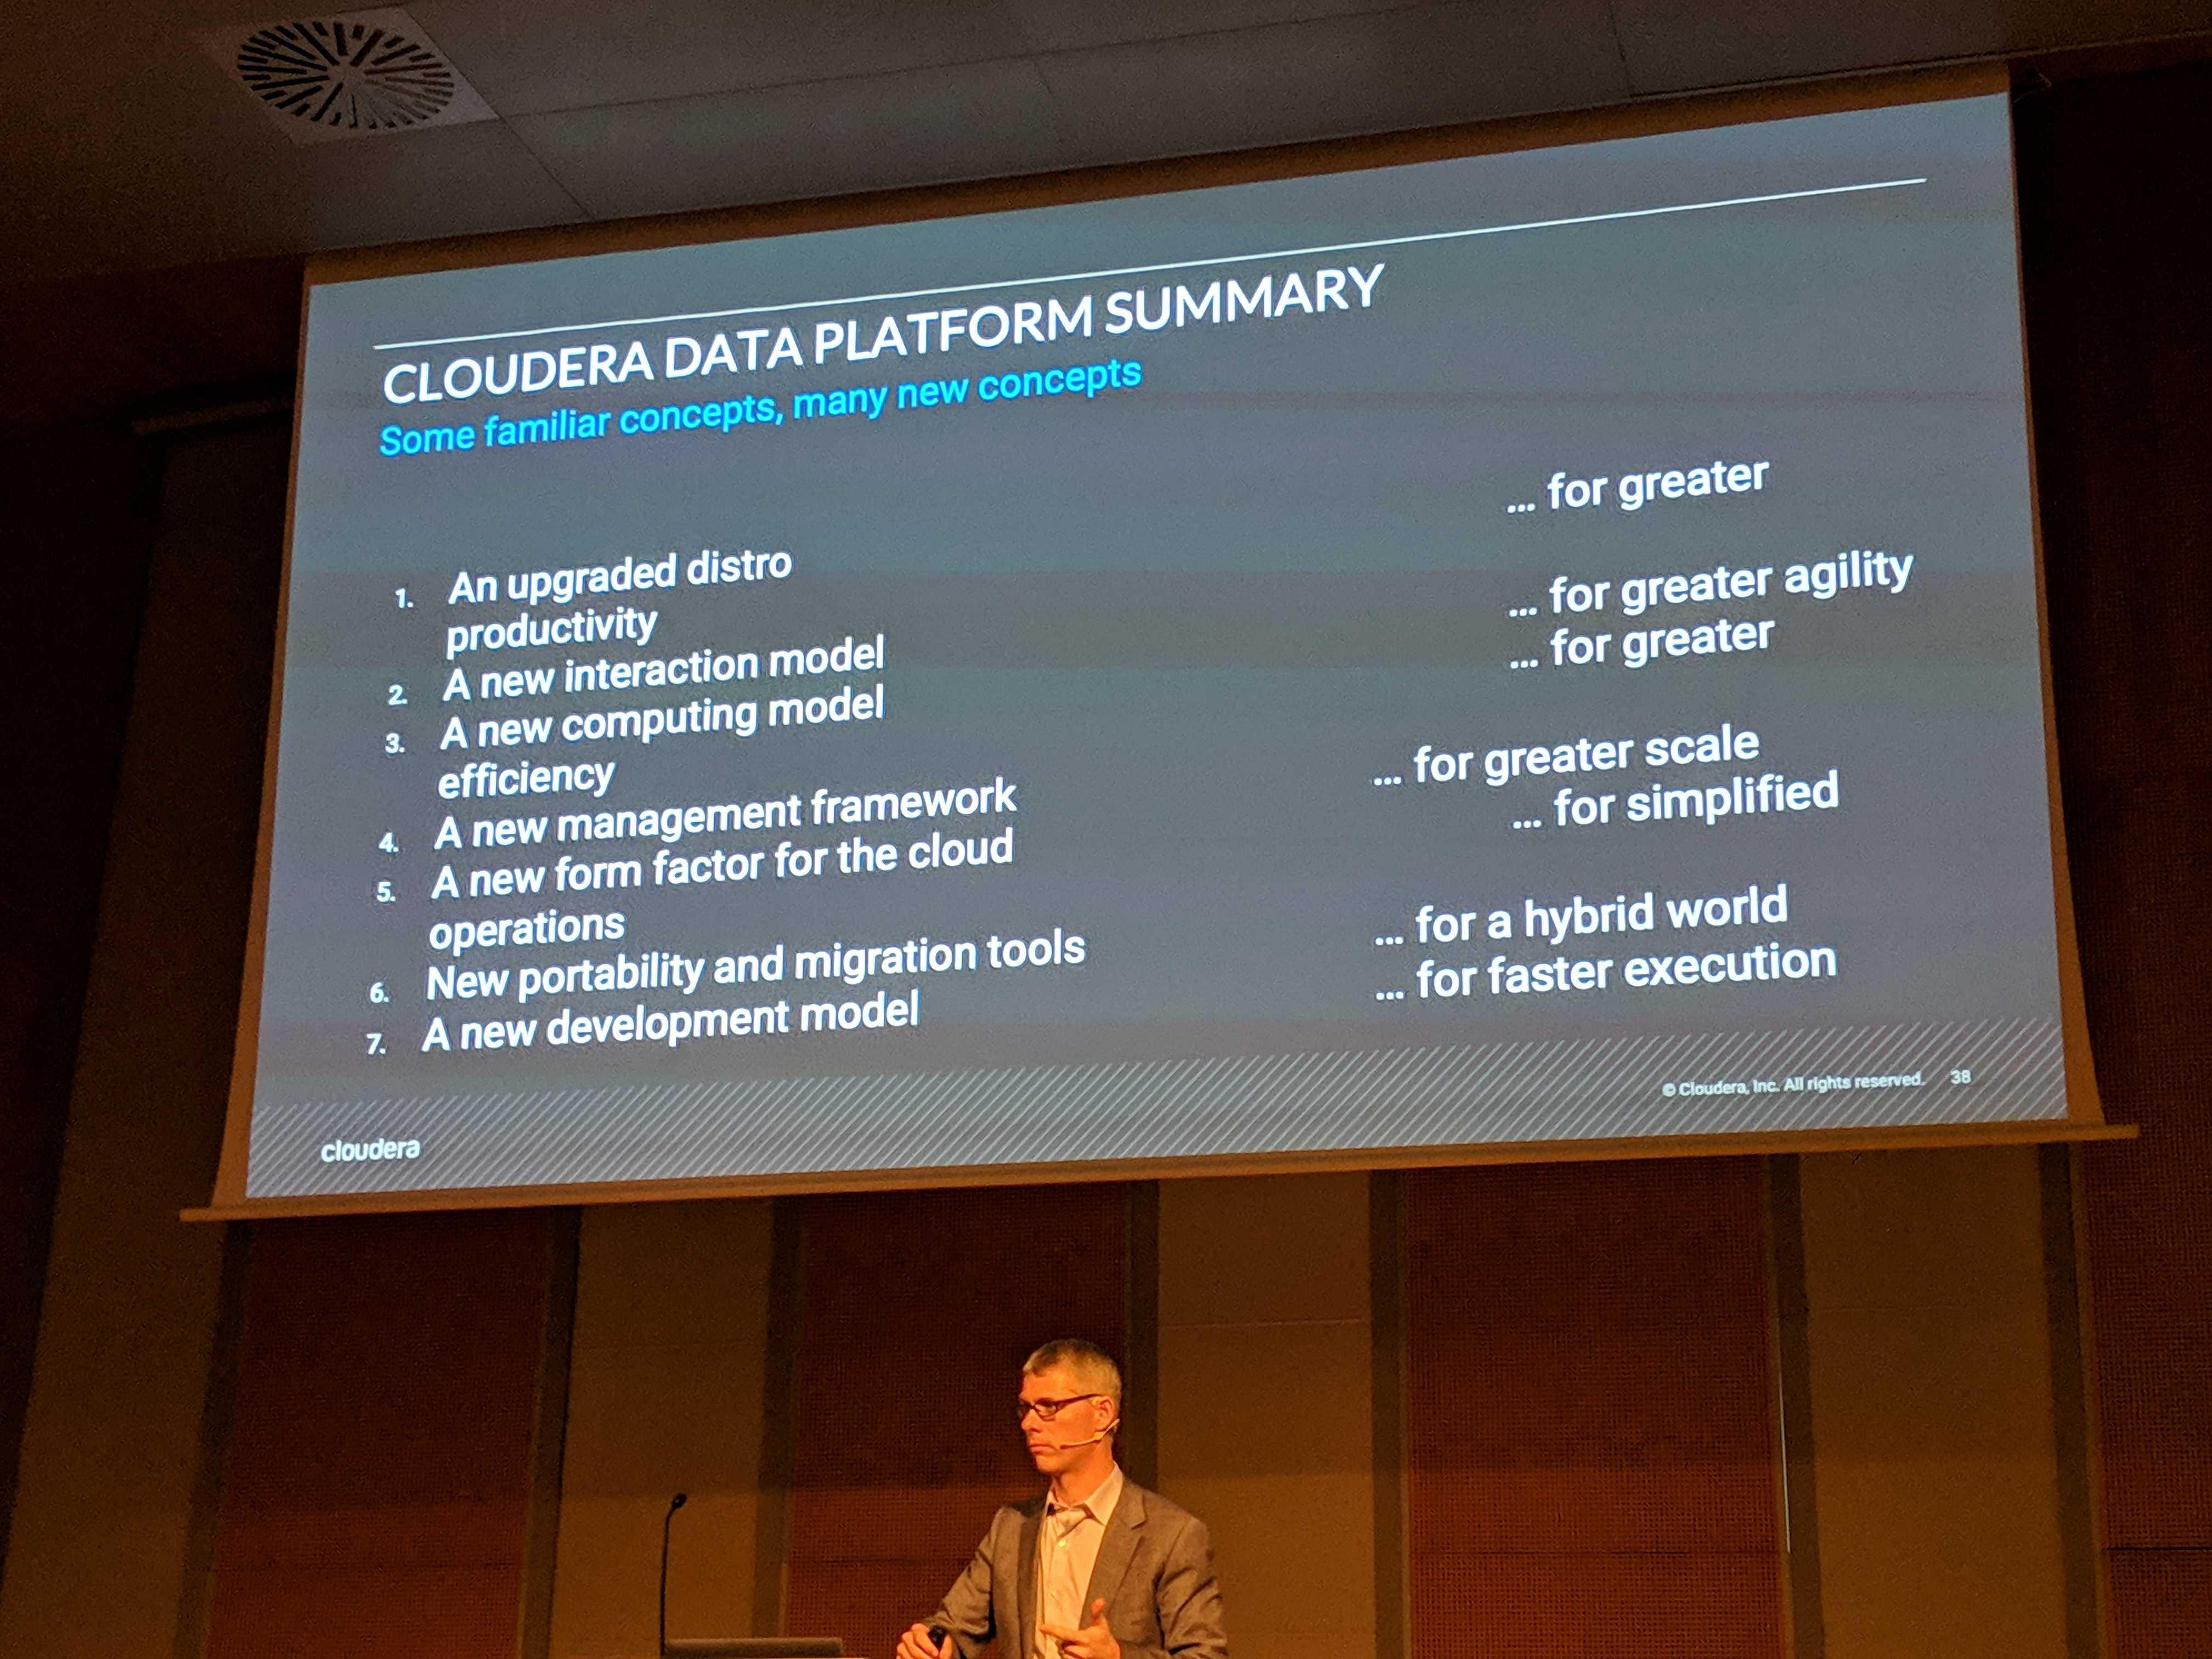 Koopmans presenting at Cloudera DataWorks 2019